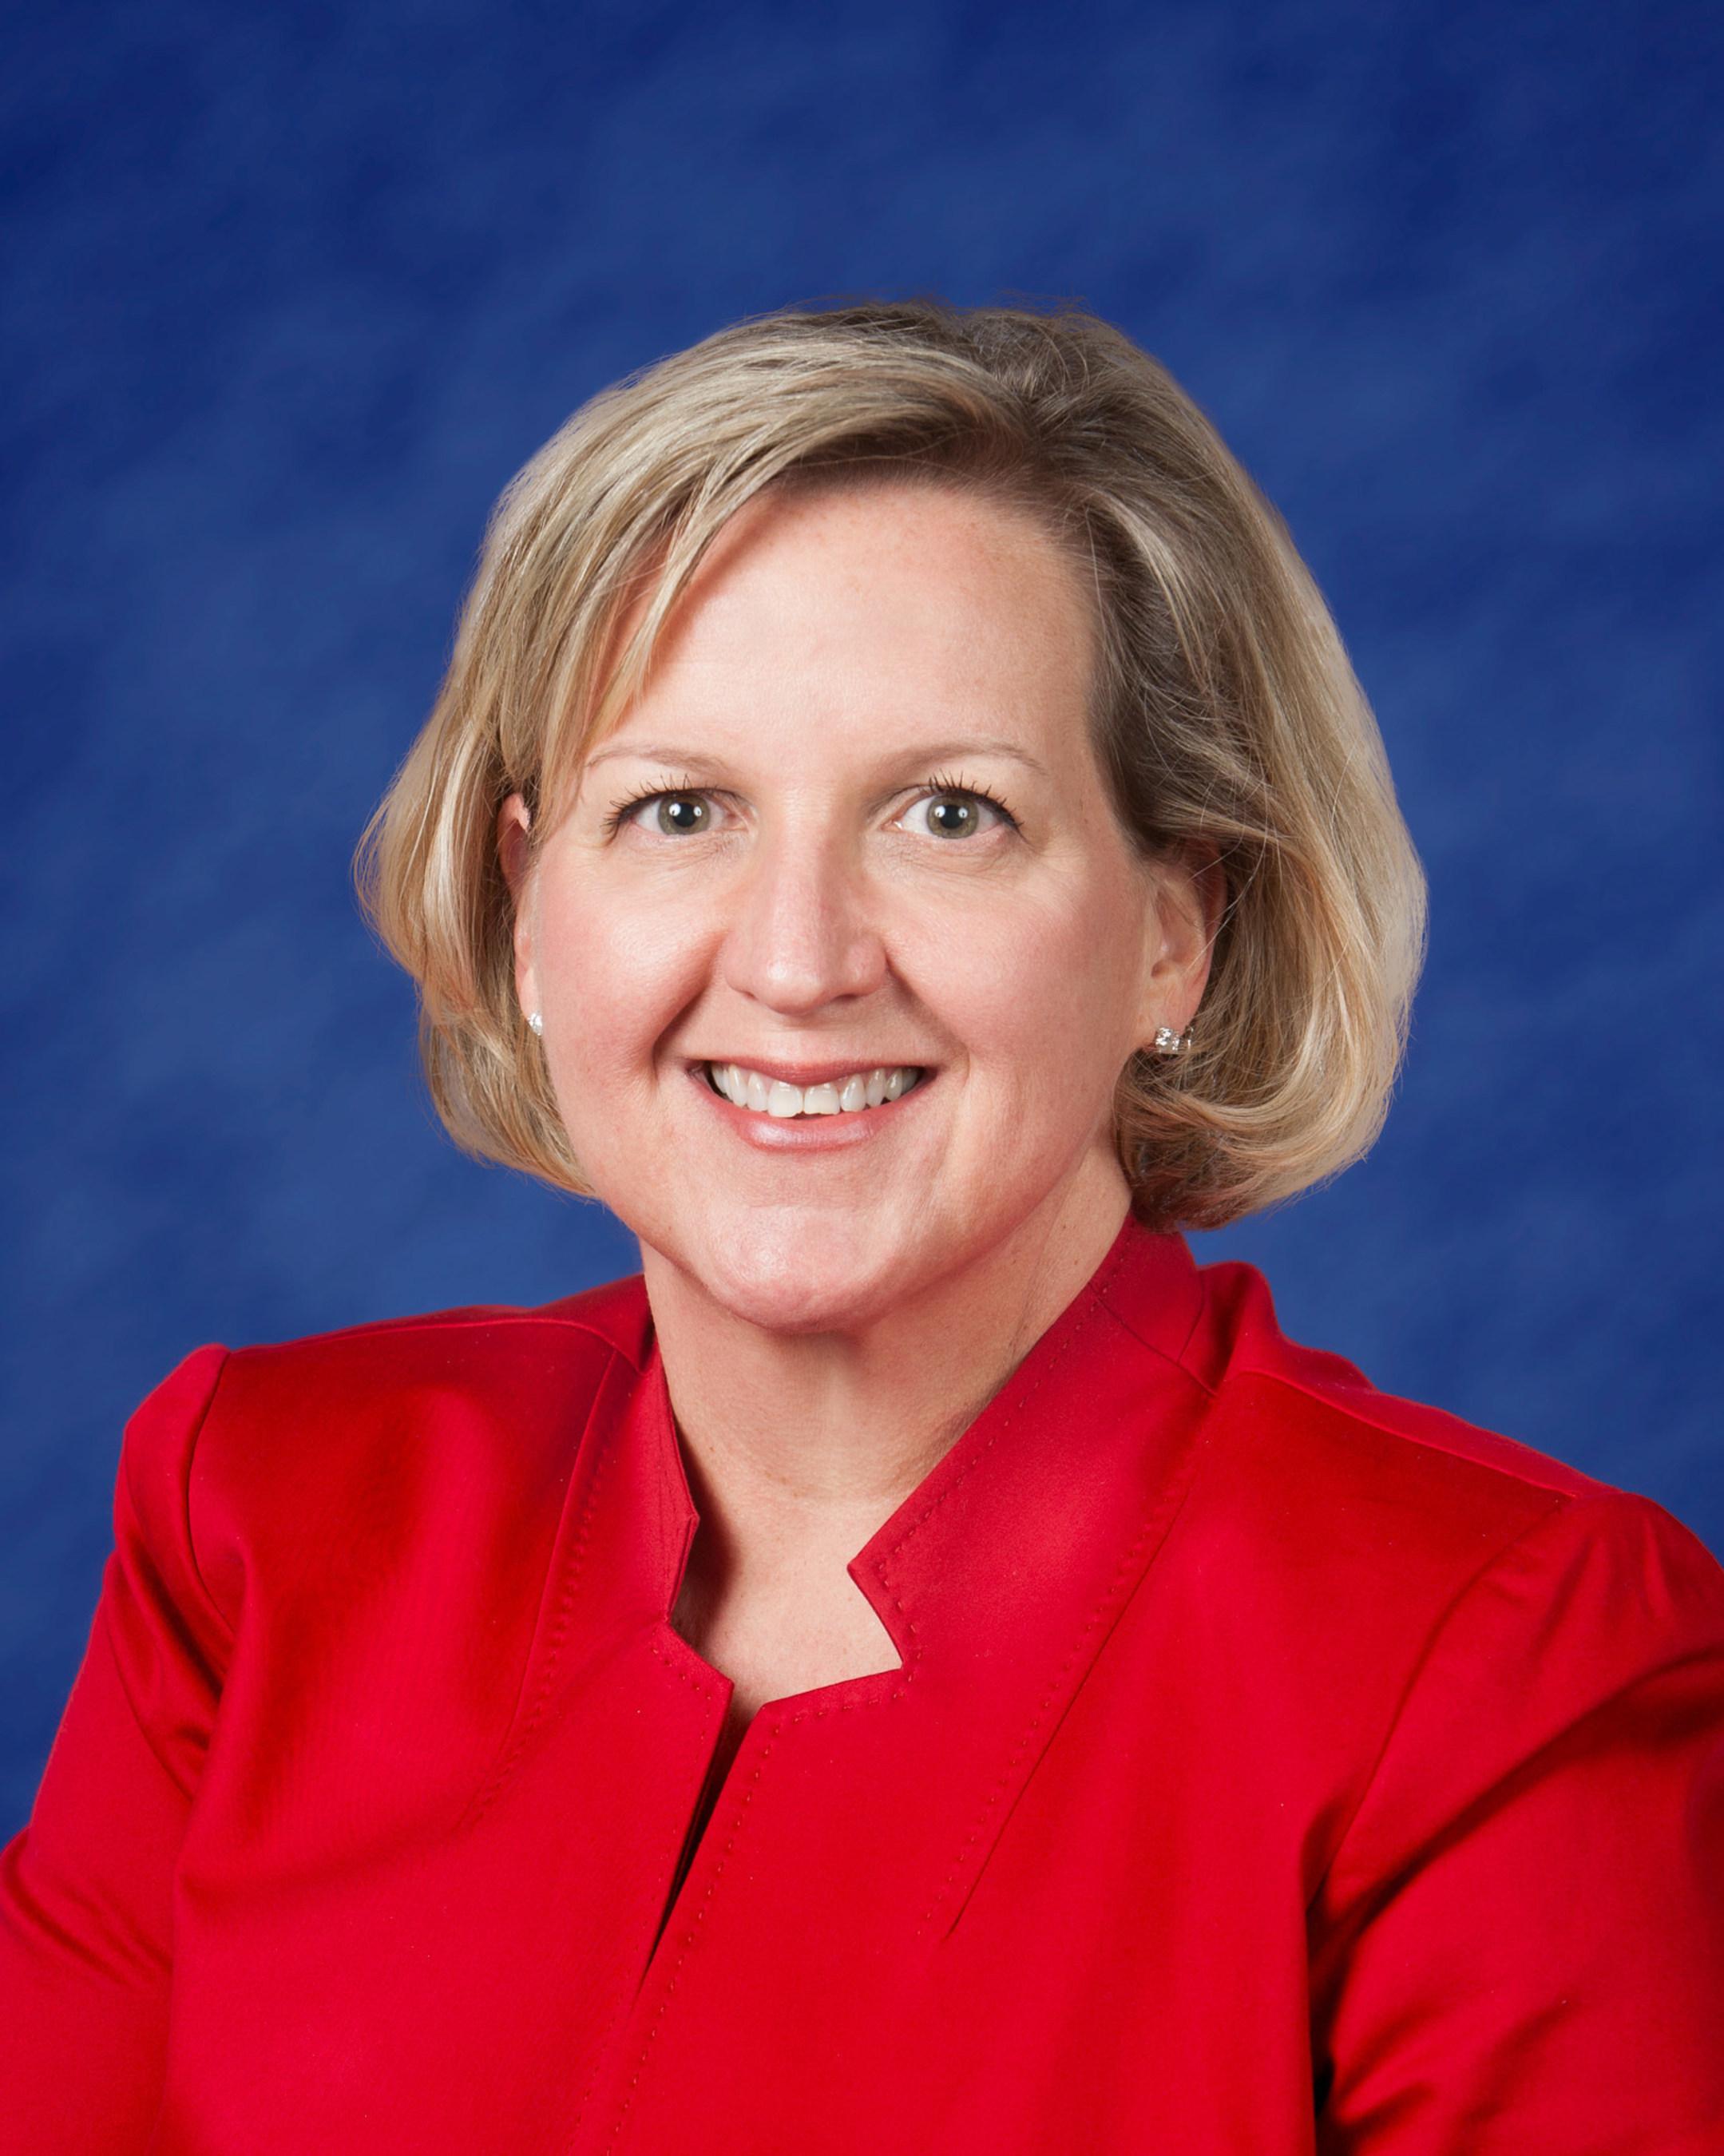 Lauralie Rubel, WellCare's State President, Nebraska